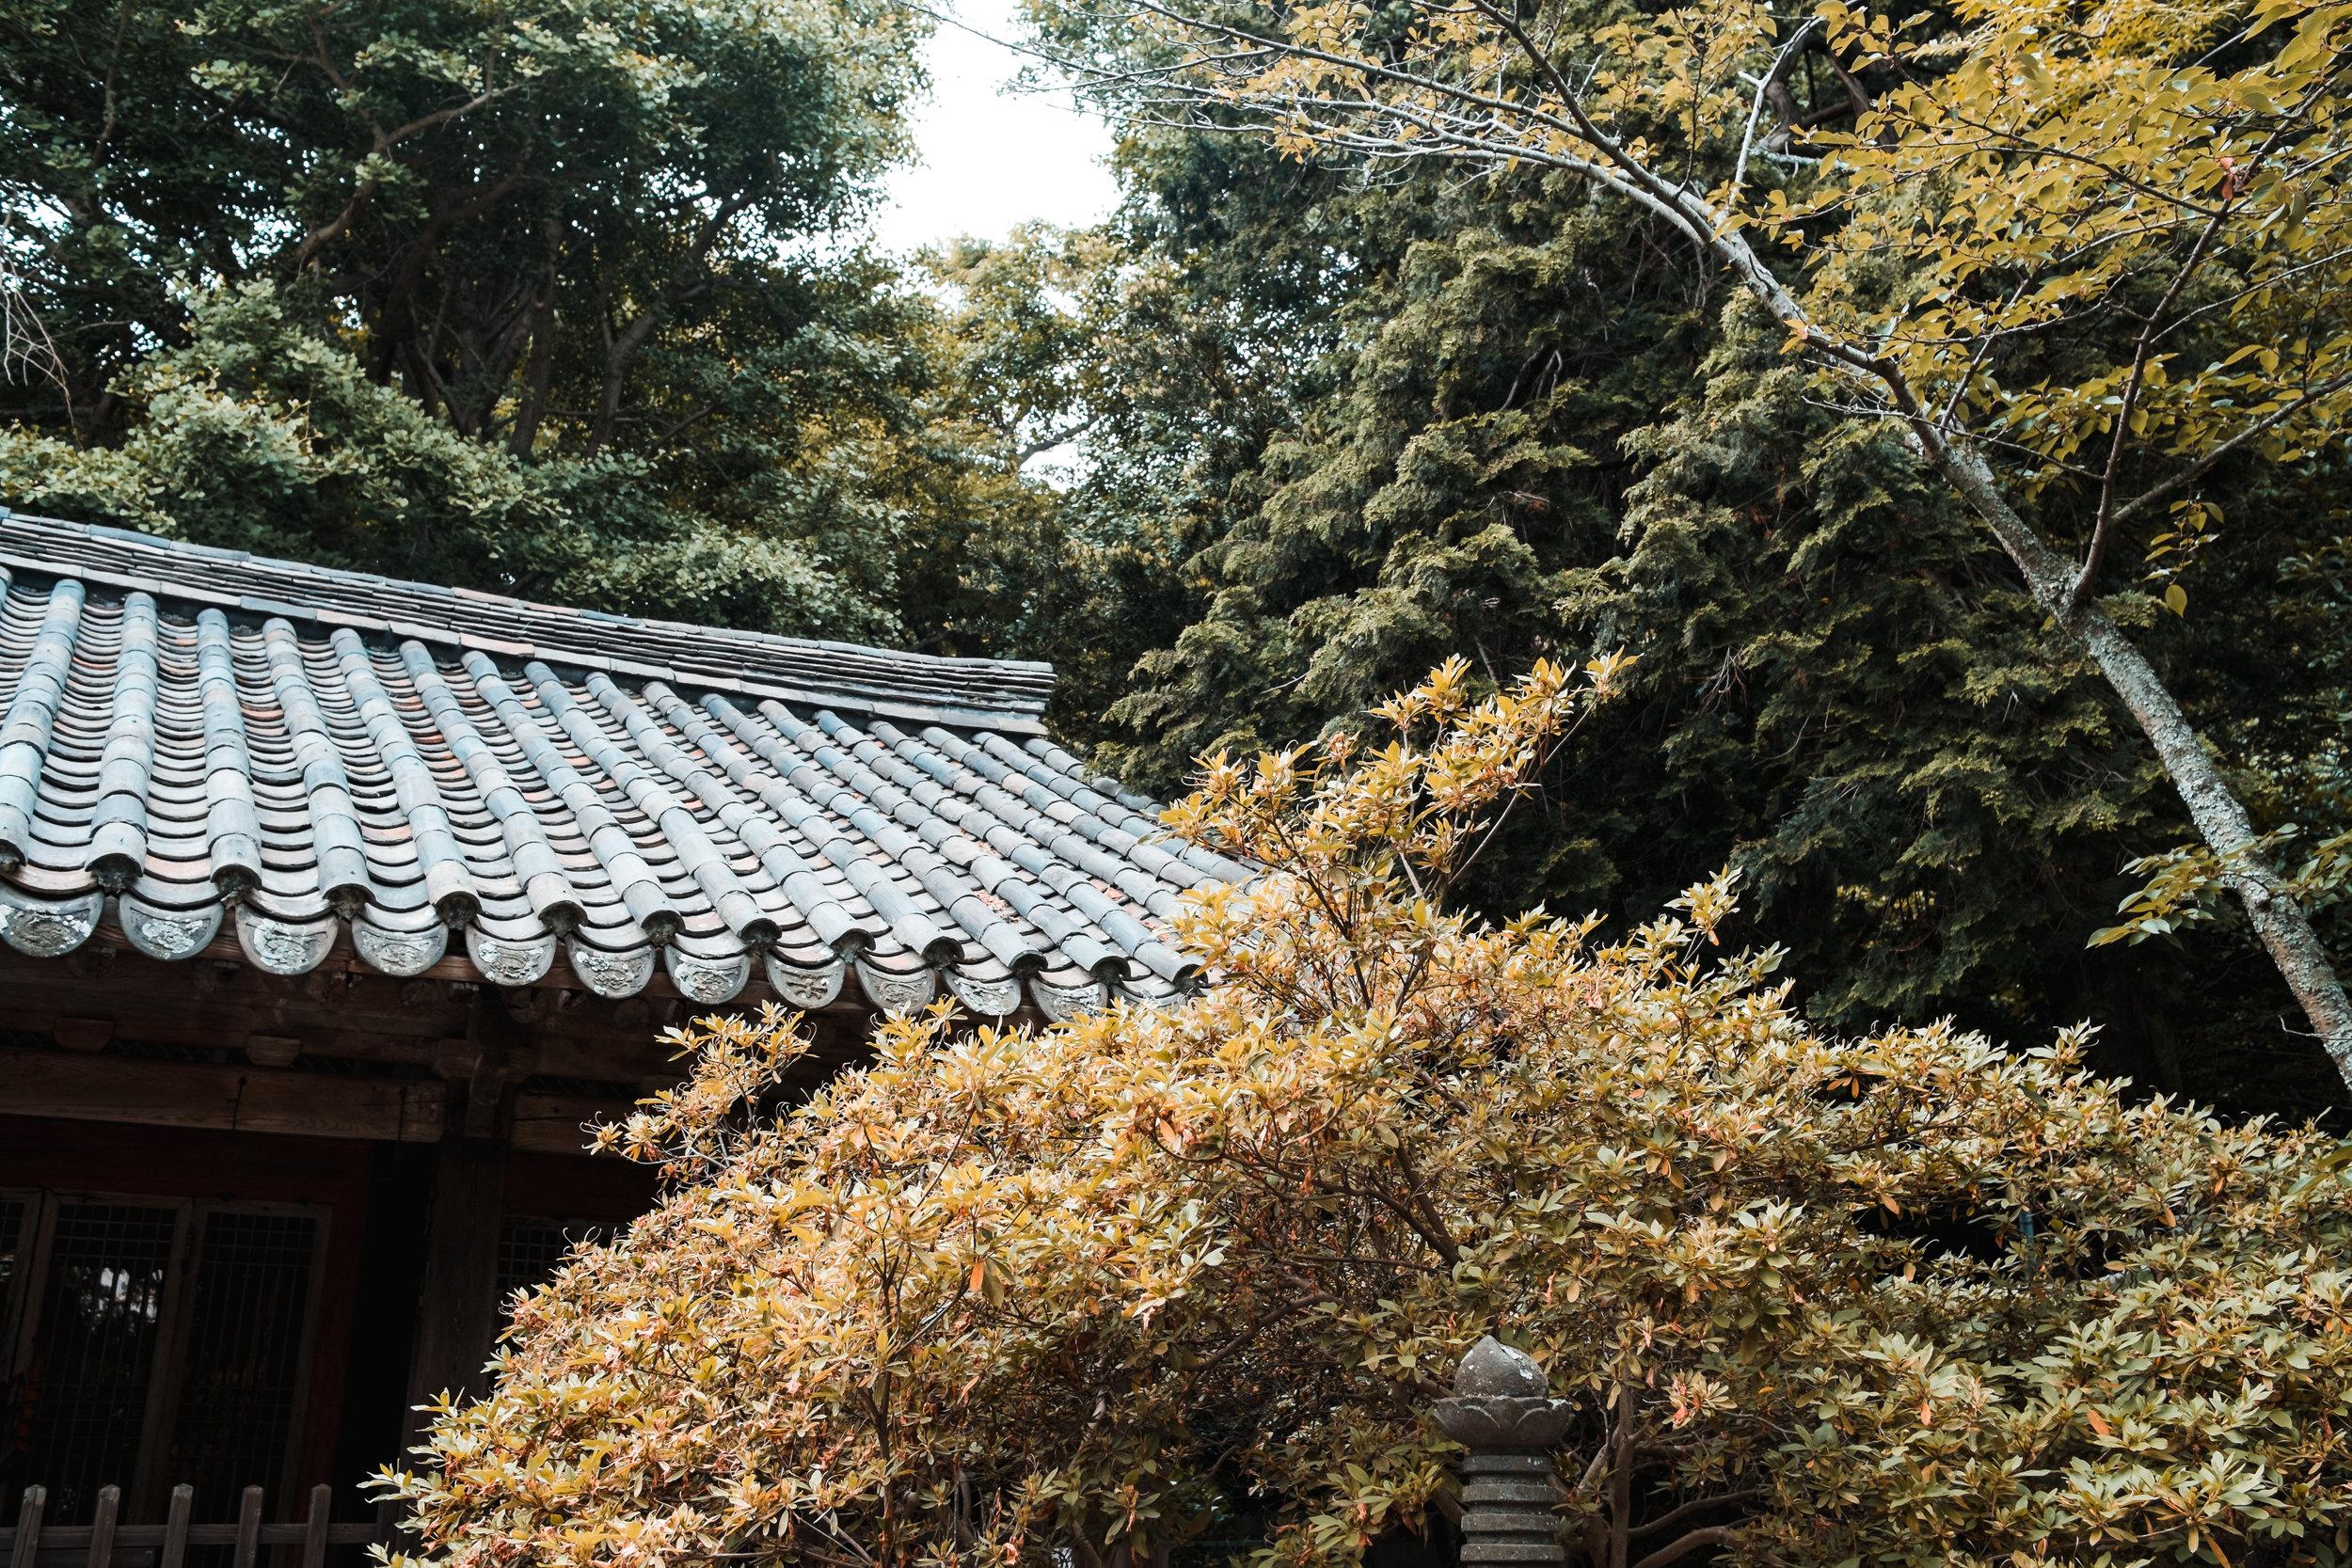 TokyoJapan_2018_AdamDillon_DSCF9563.jpg